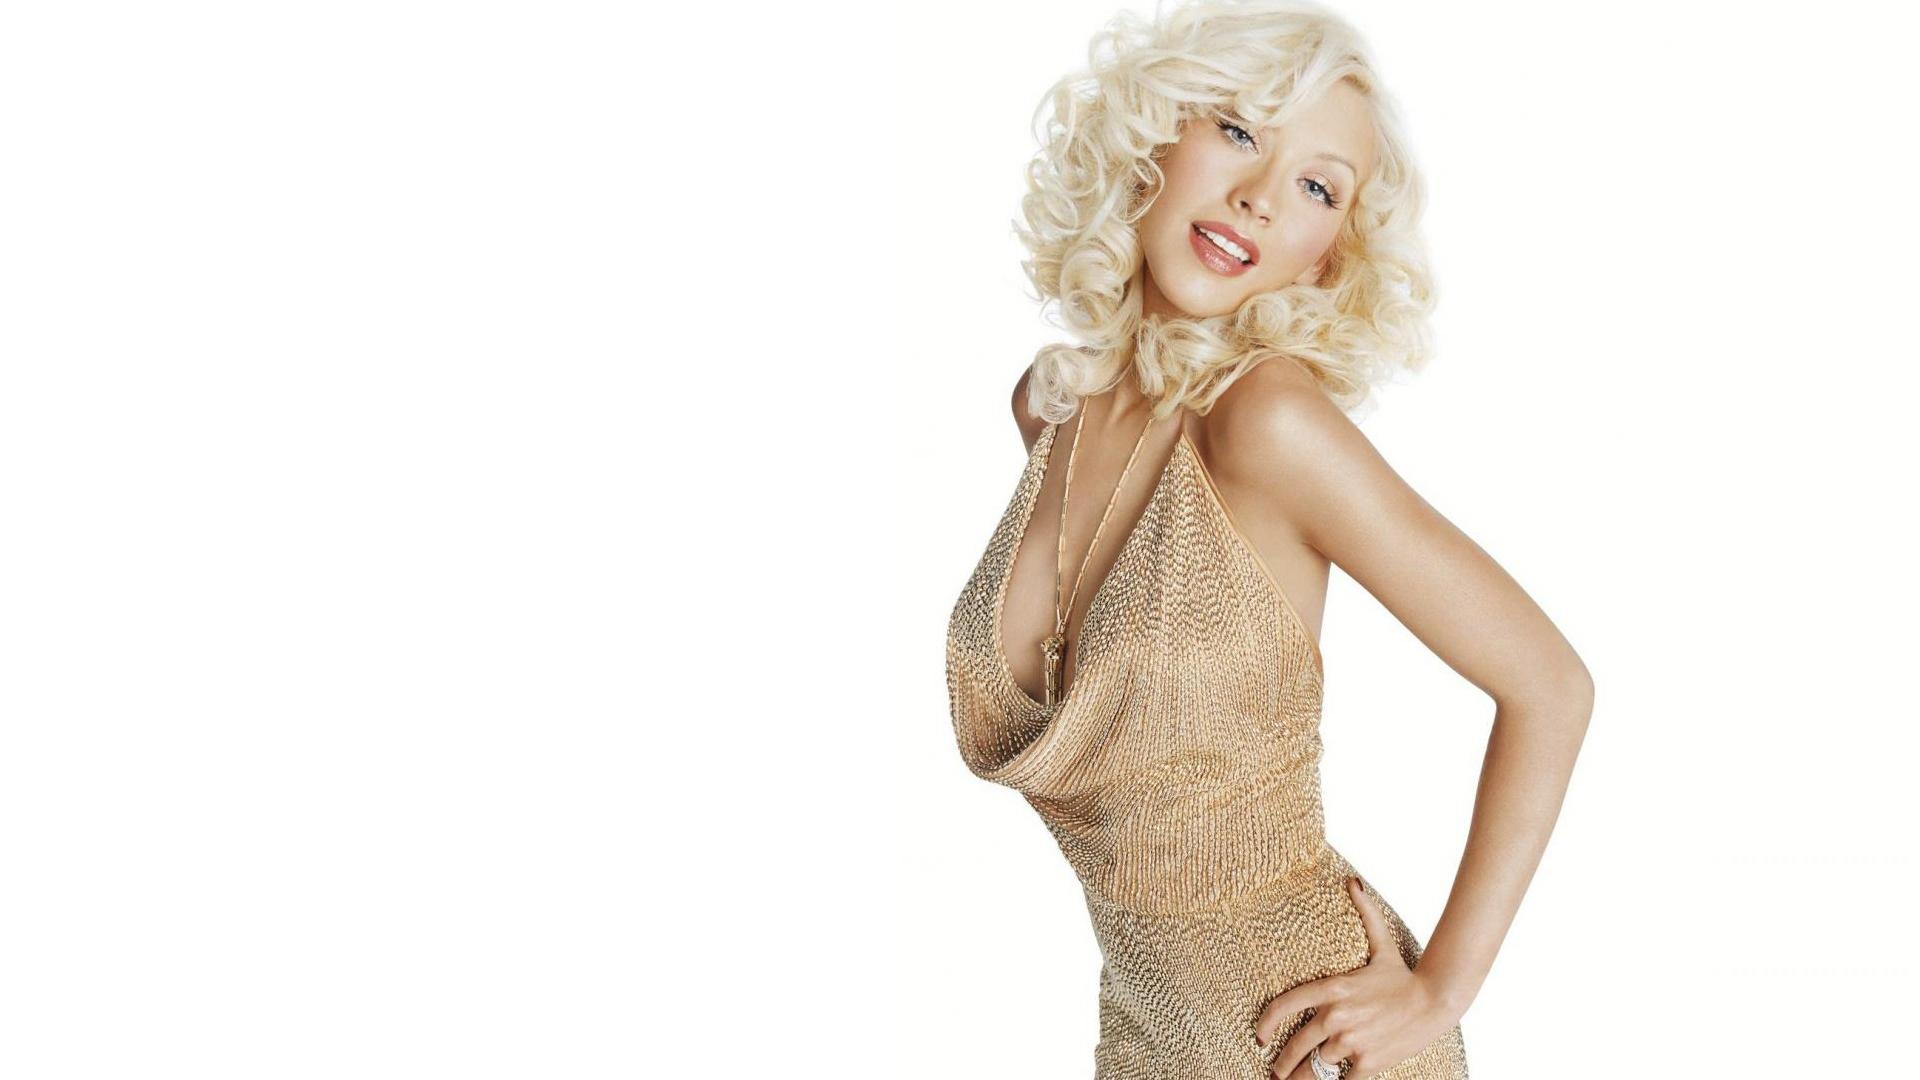 http://2.bp.blogspot.com/-WFa-lu8hNhA/UDT1V45Hq7I/AAAAAAAADr8/tadlhPUTSVY/s1920/Christina-Aguilera-1-1080.jpg